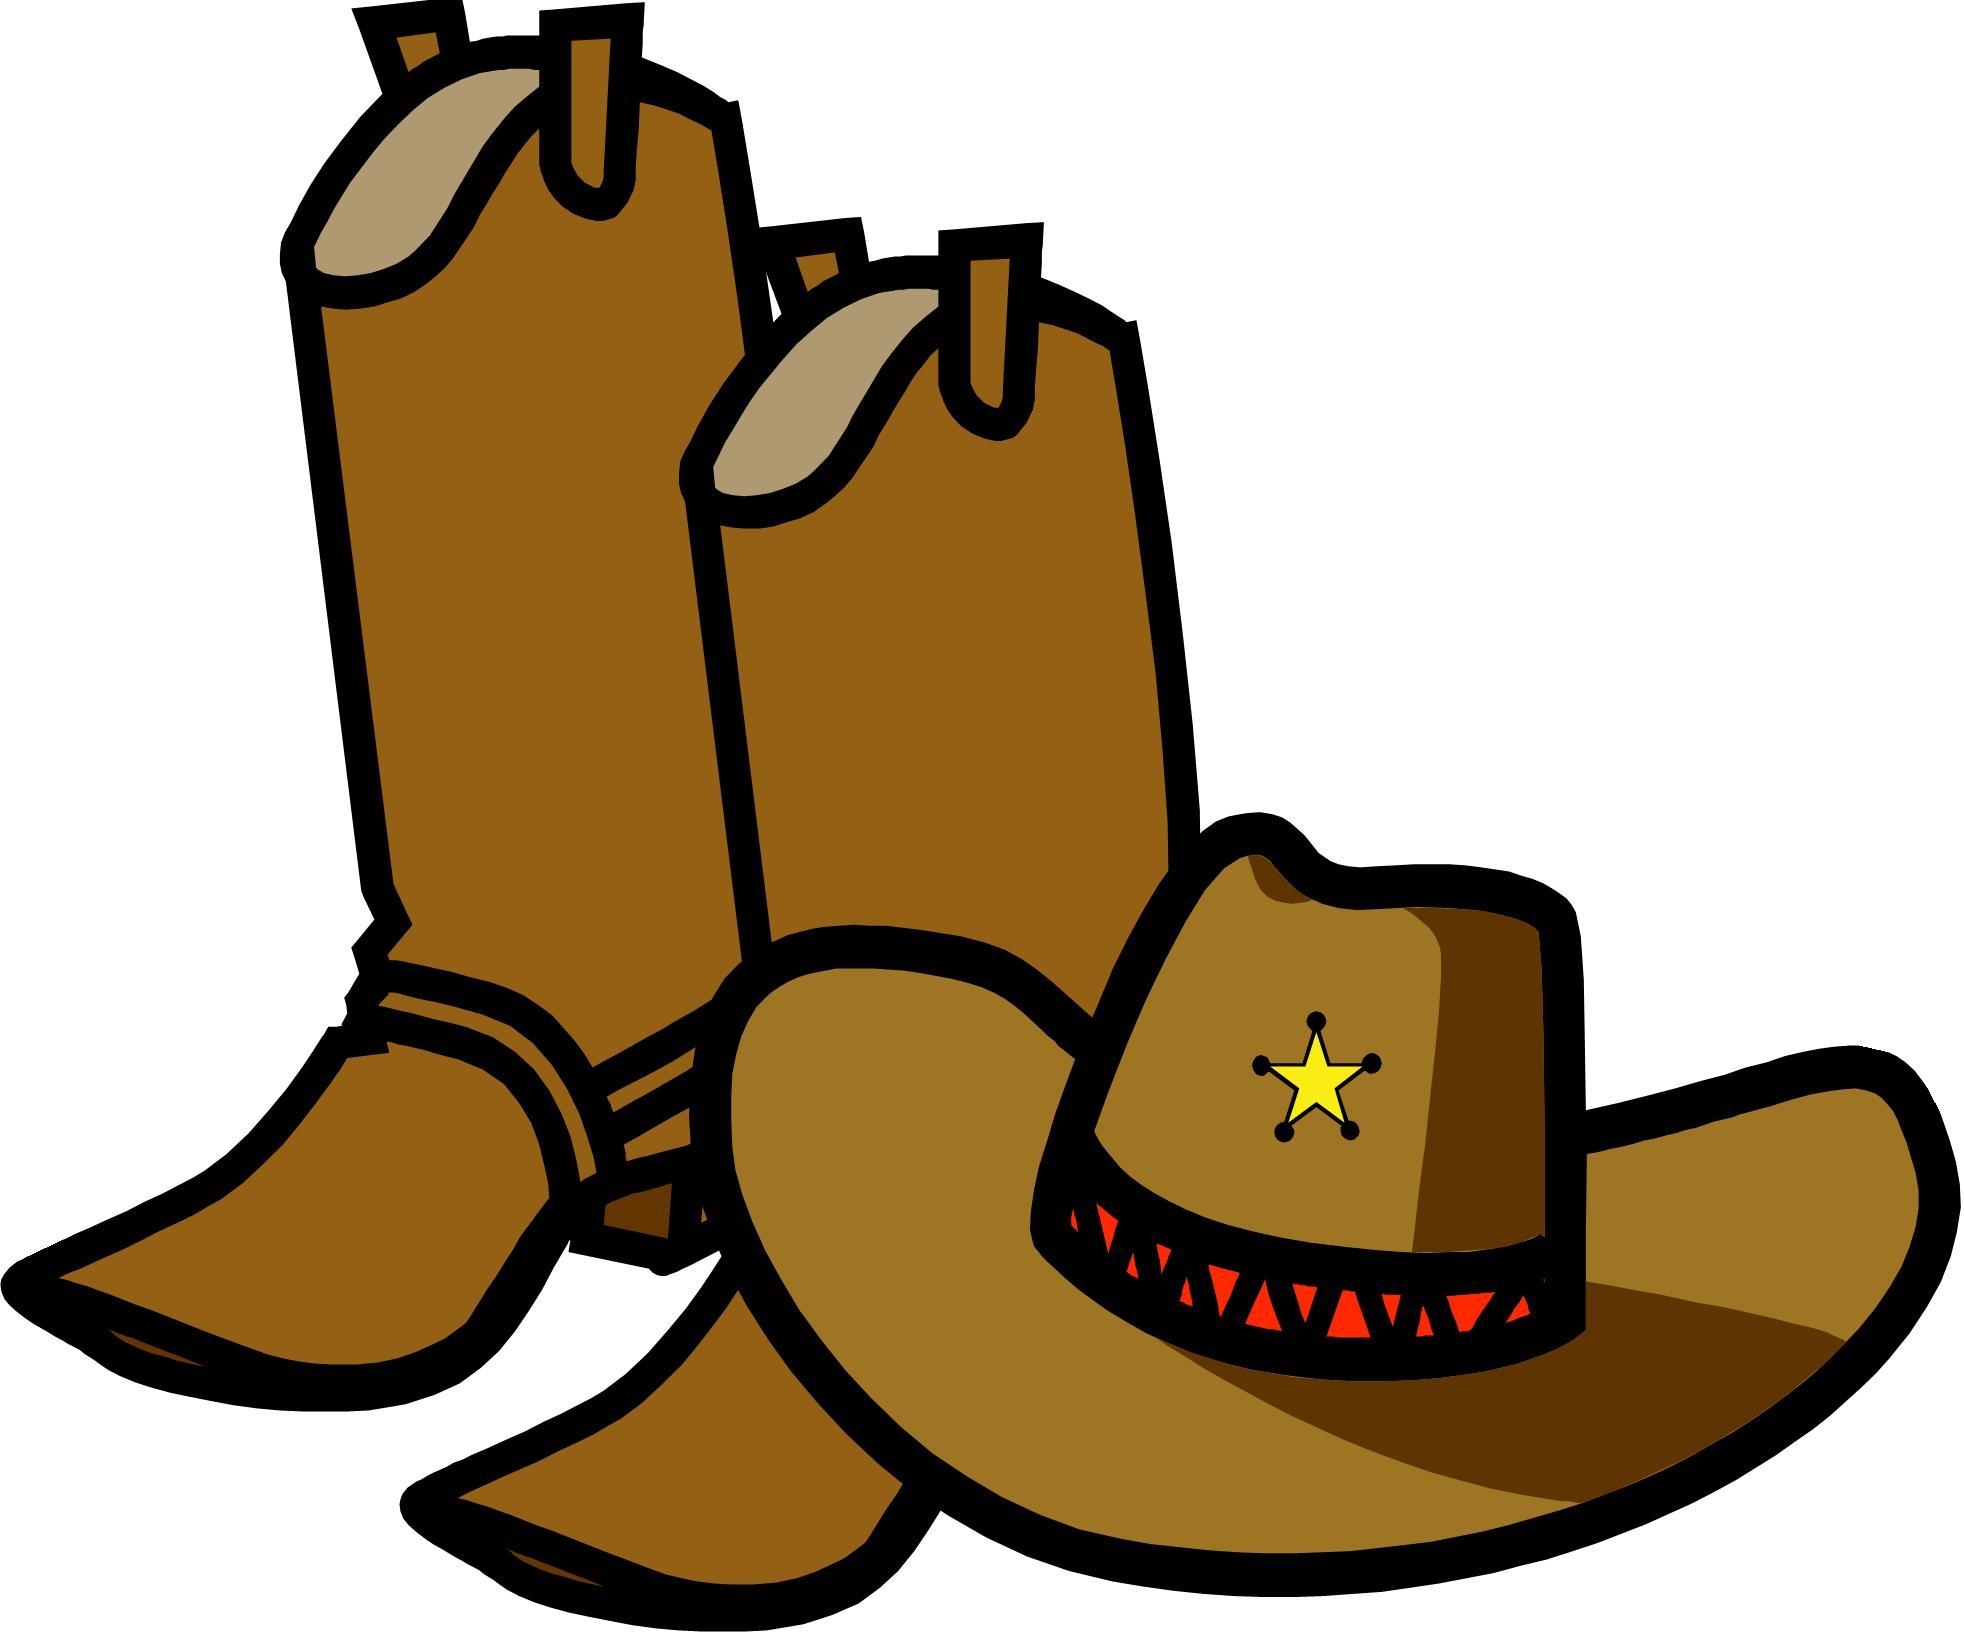 1964x1637 Cowboy Boots Clipart Black And Whitewboy Clip Art Image 2